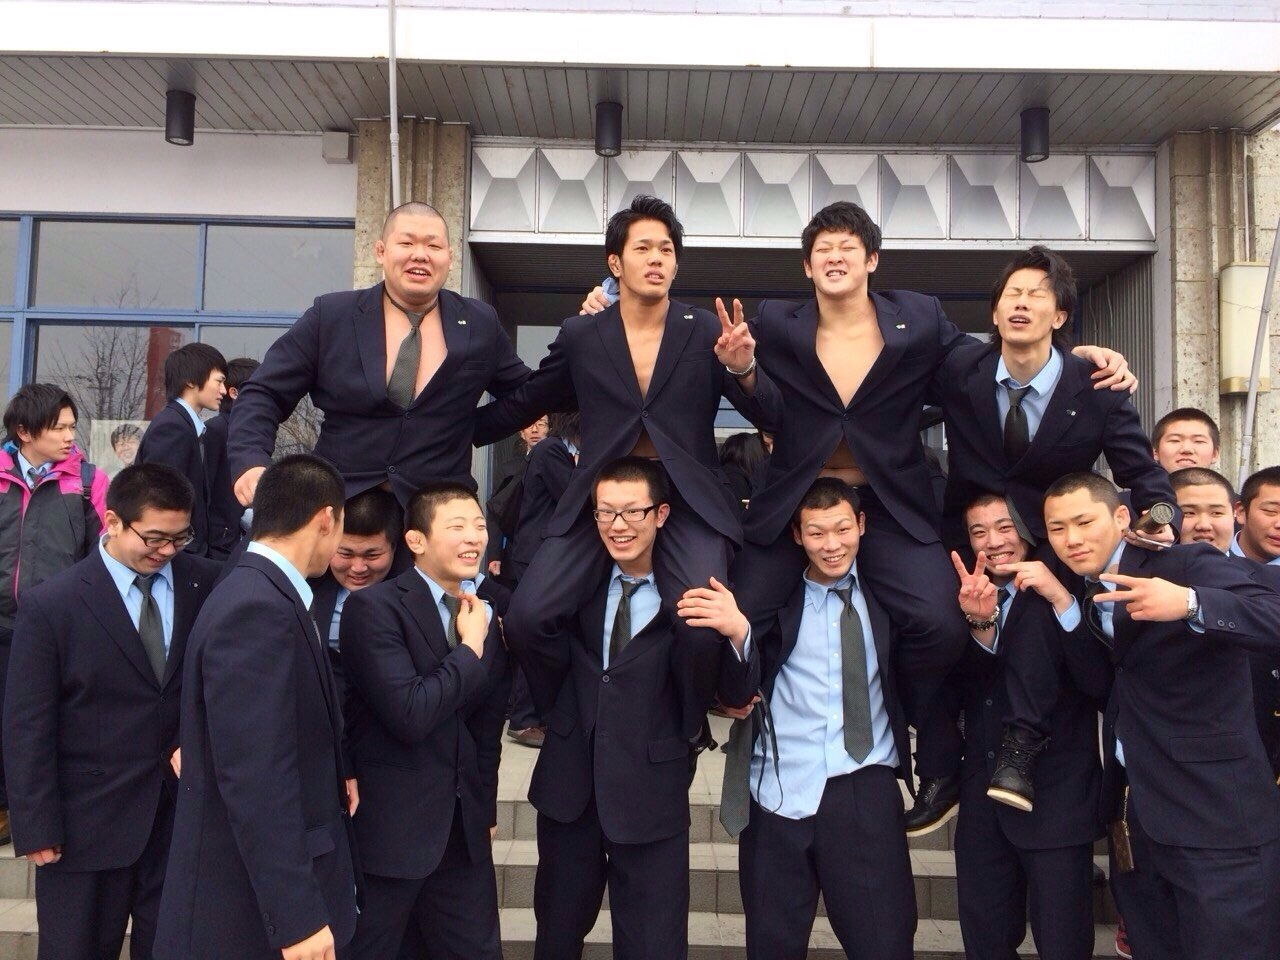 Images of 旭川龍谷高等学校 - JapaneseClass.jp